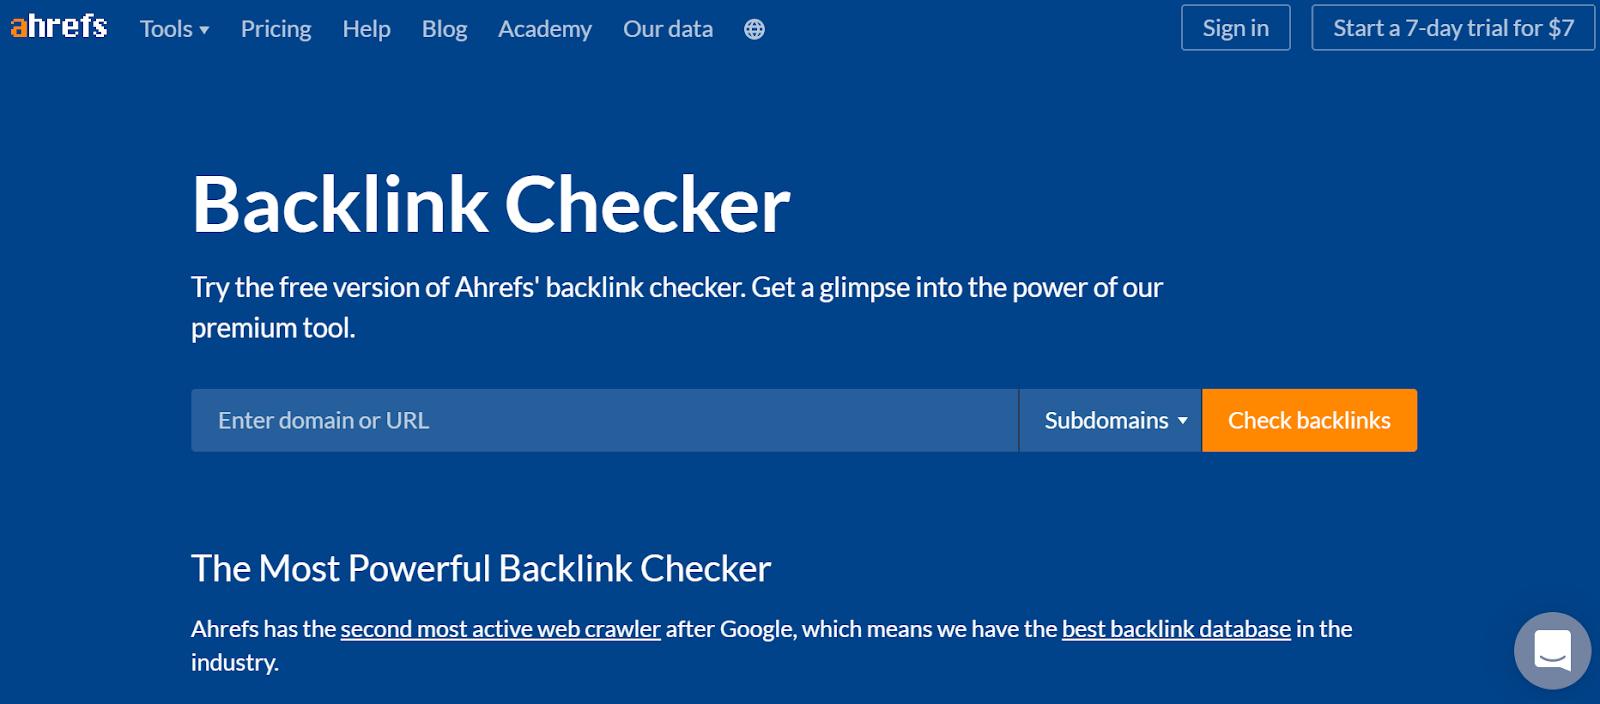 Ahrefs Backlink Checker